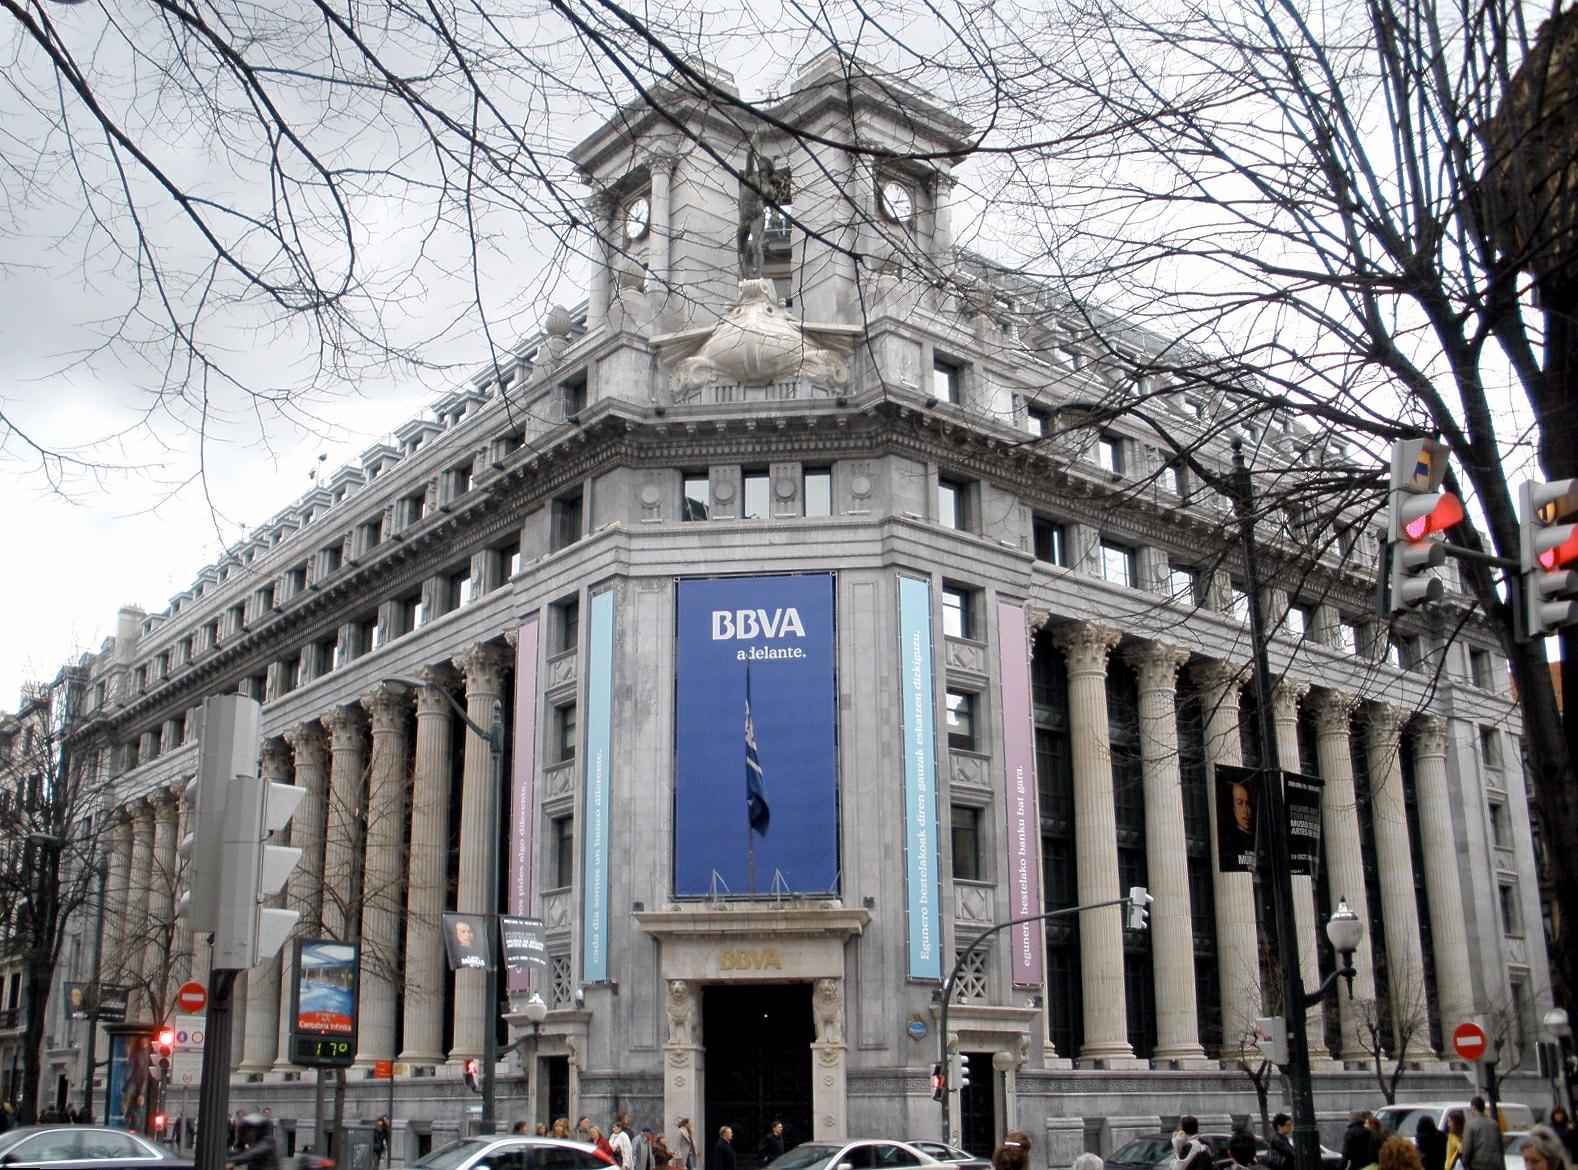 Bilbao_-_BBVA_%28ex_Banco_de_Comercio%29